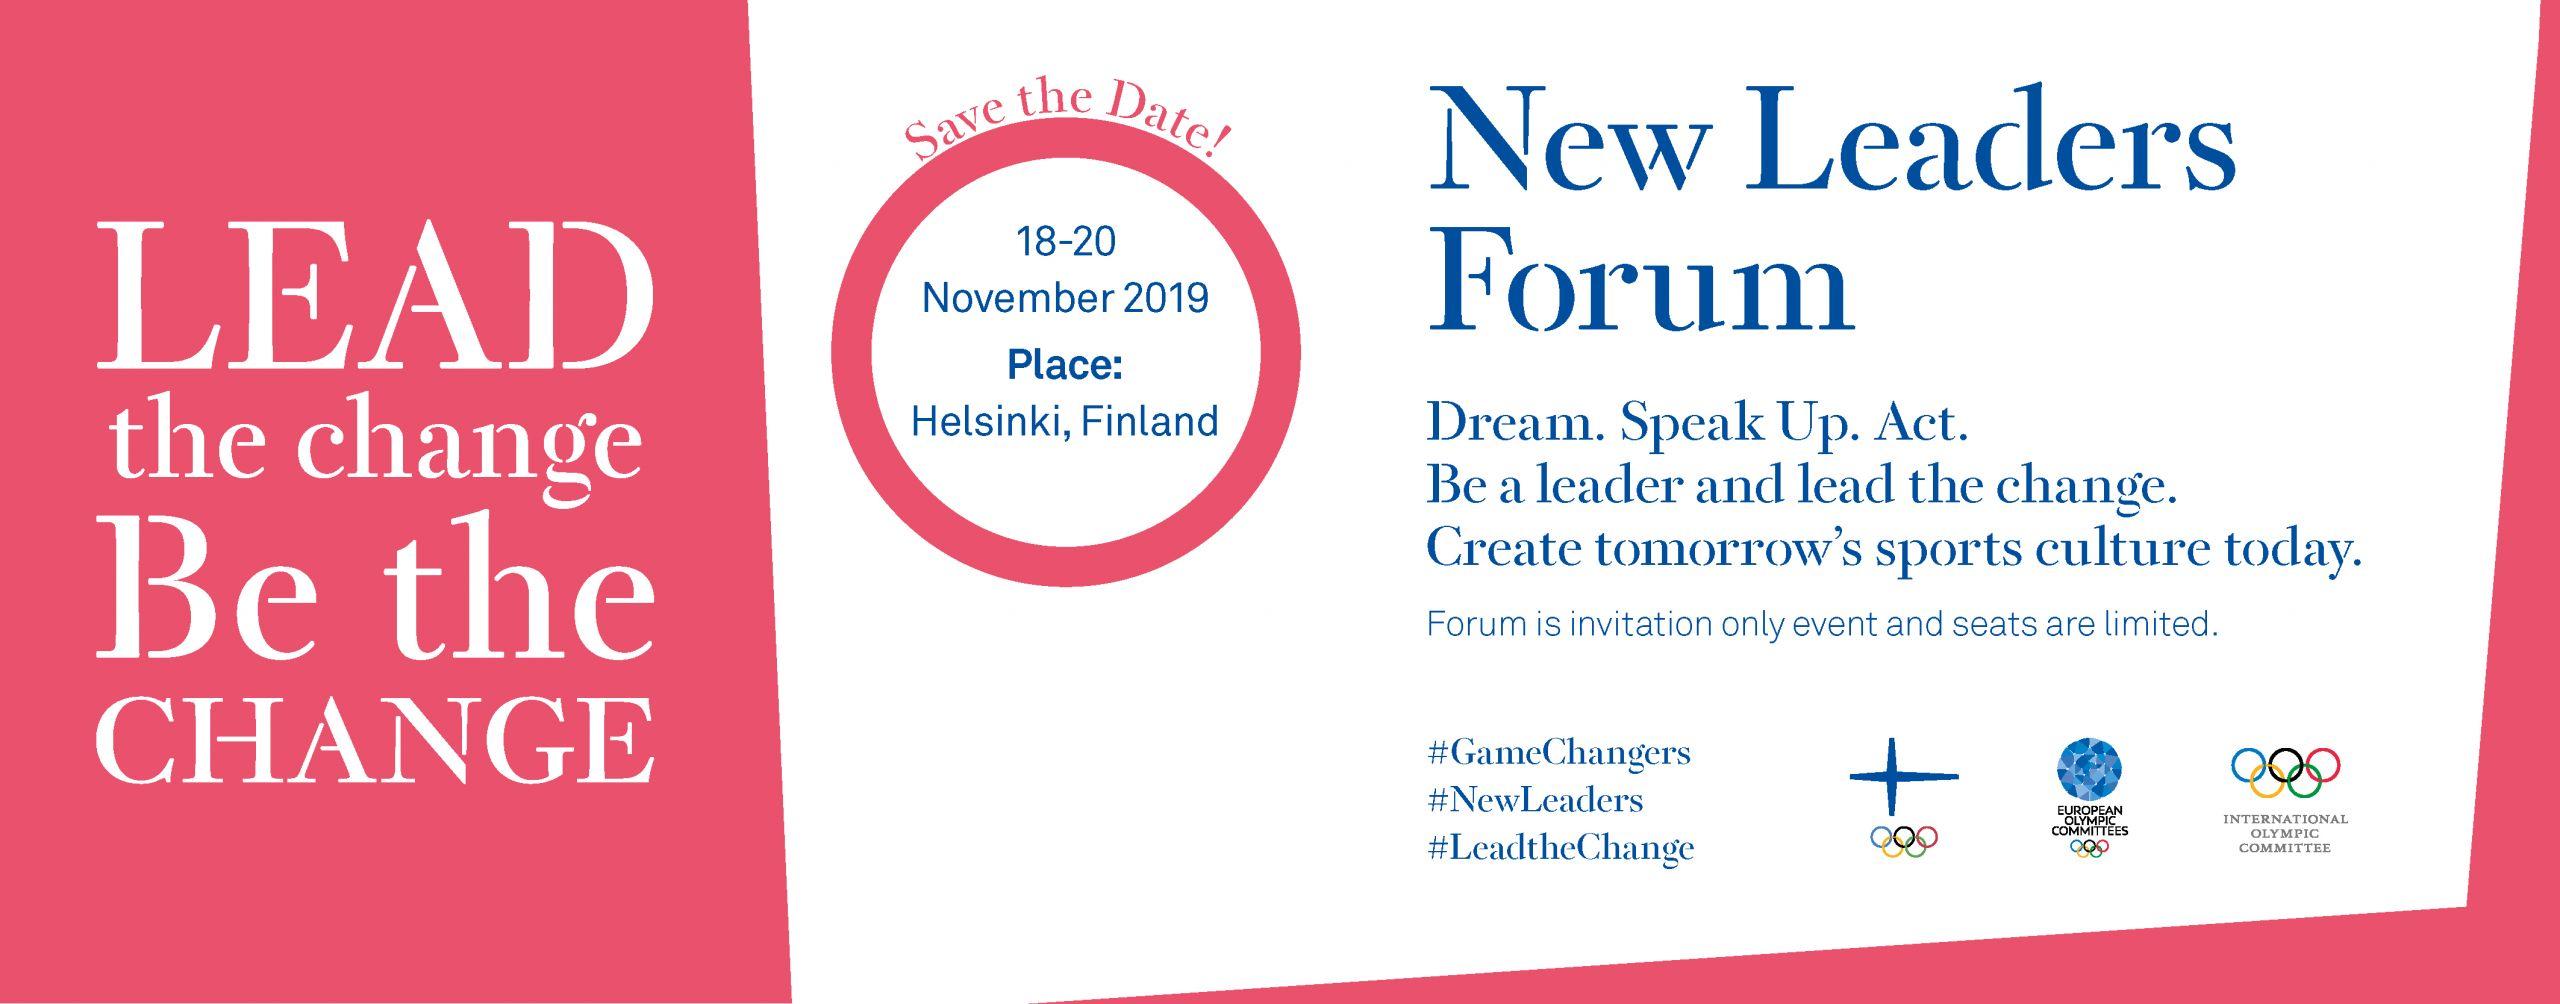 New Leaders Forum - Suomen Olympiakomitea